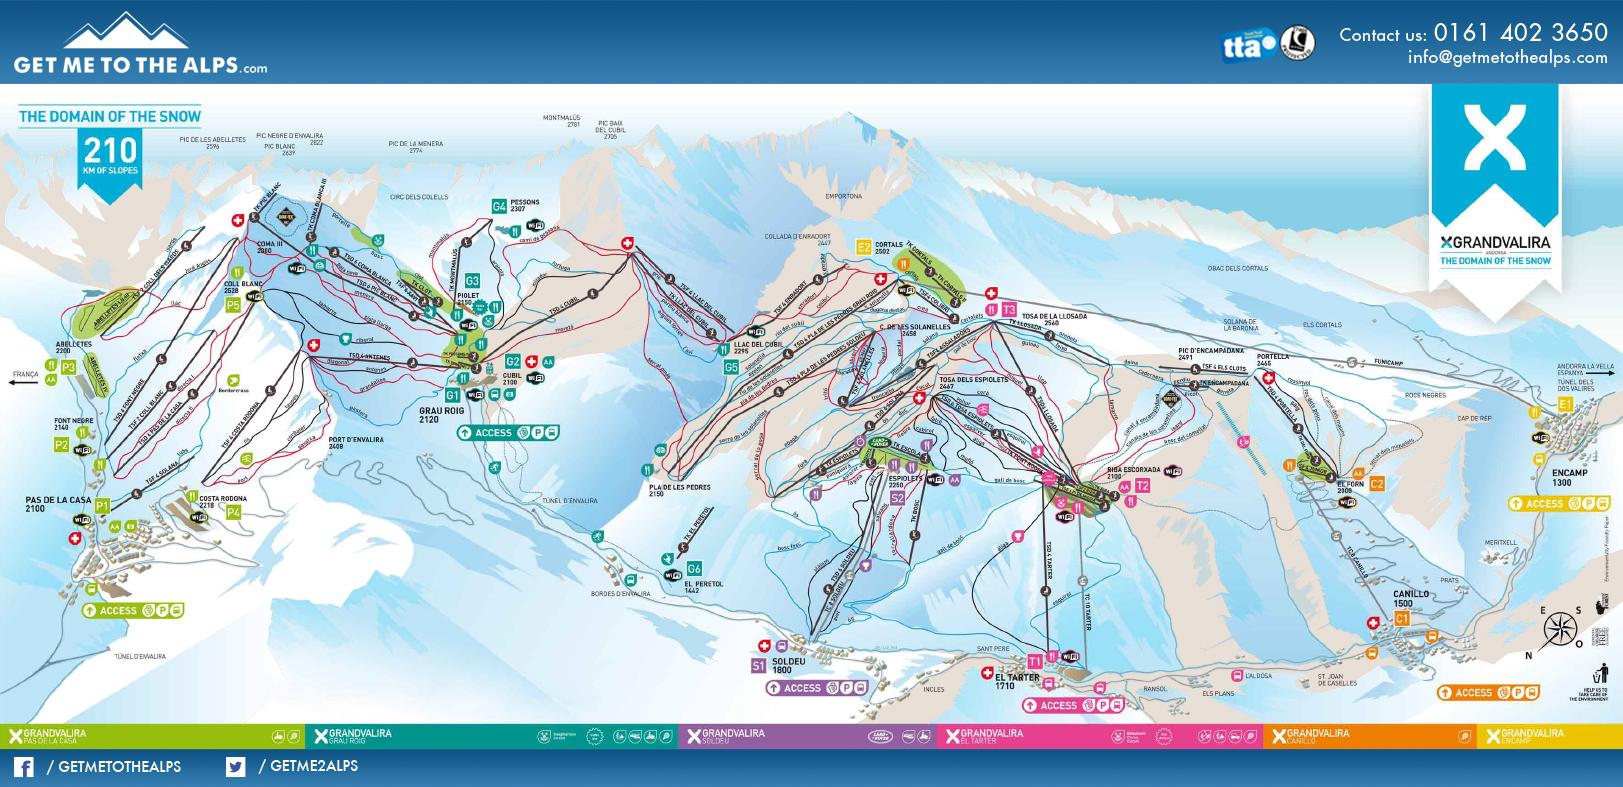 resort-pasdelacasa-piste-map